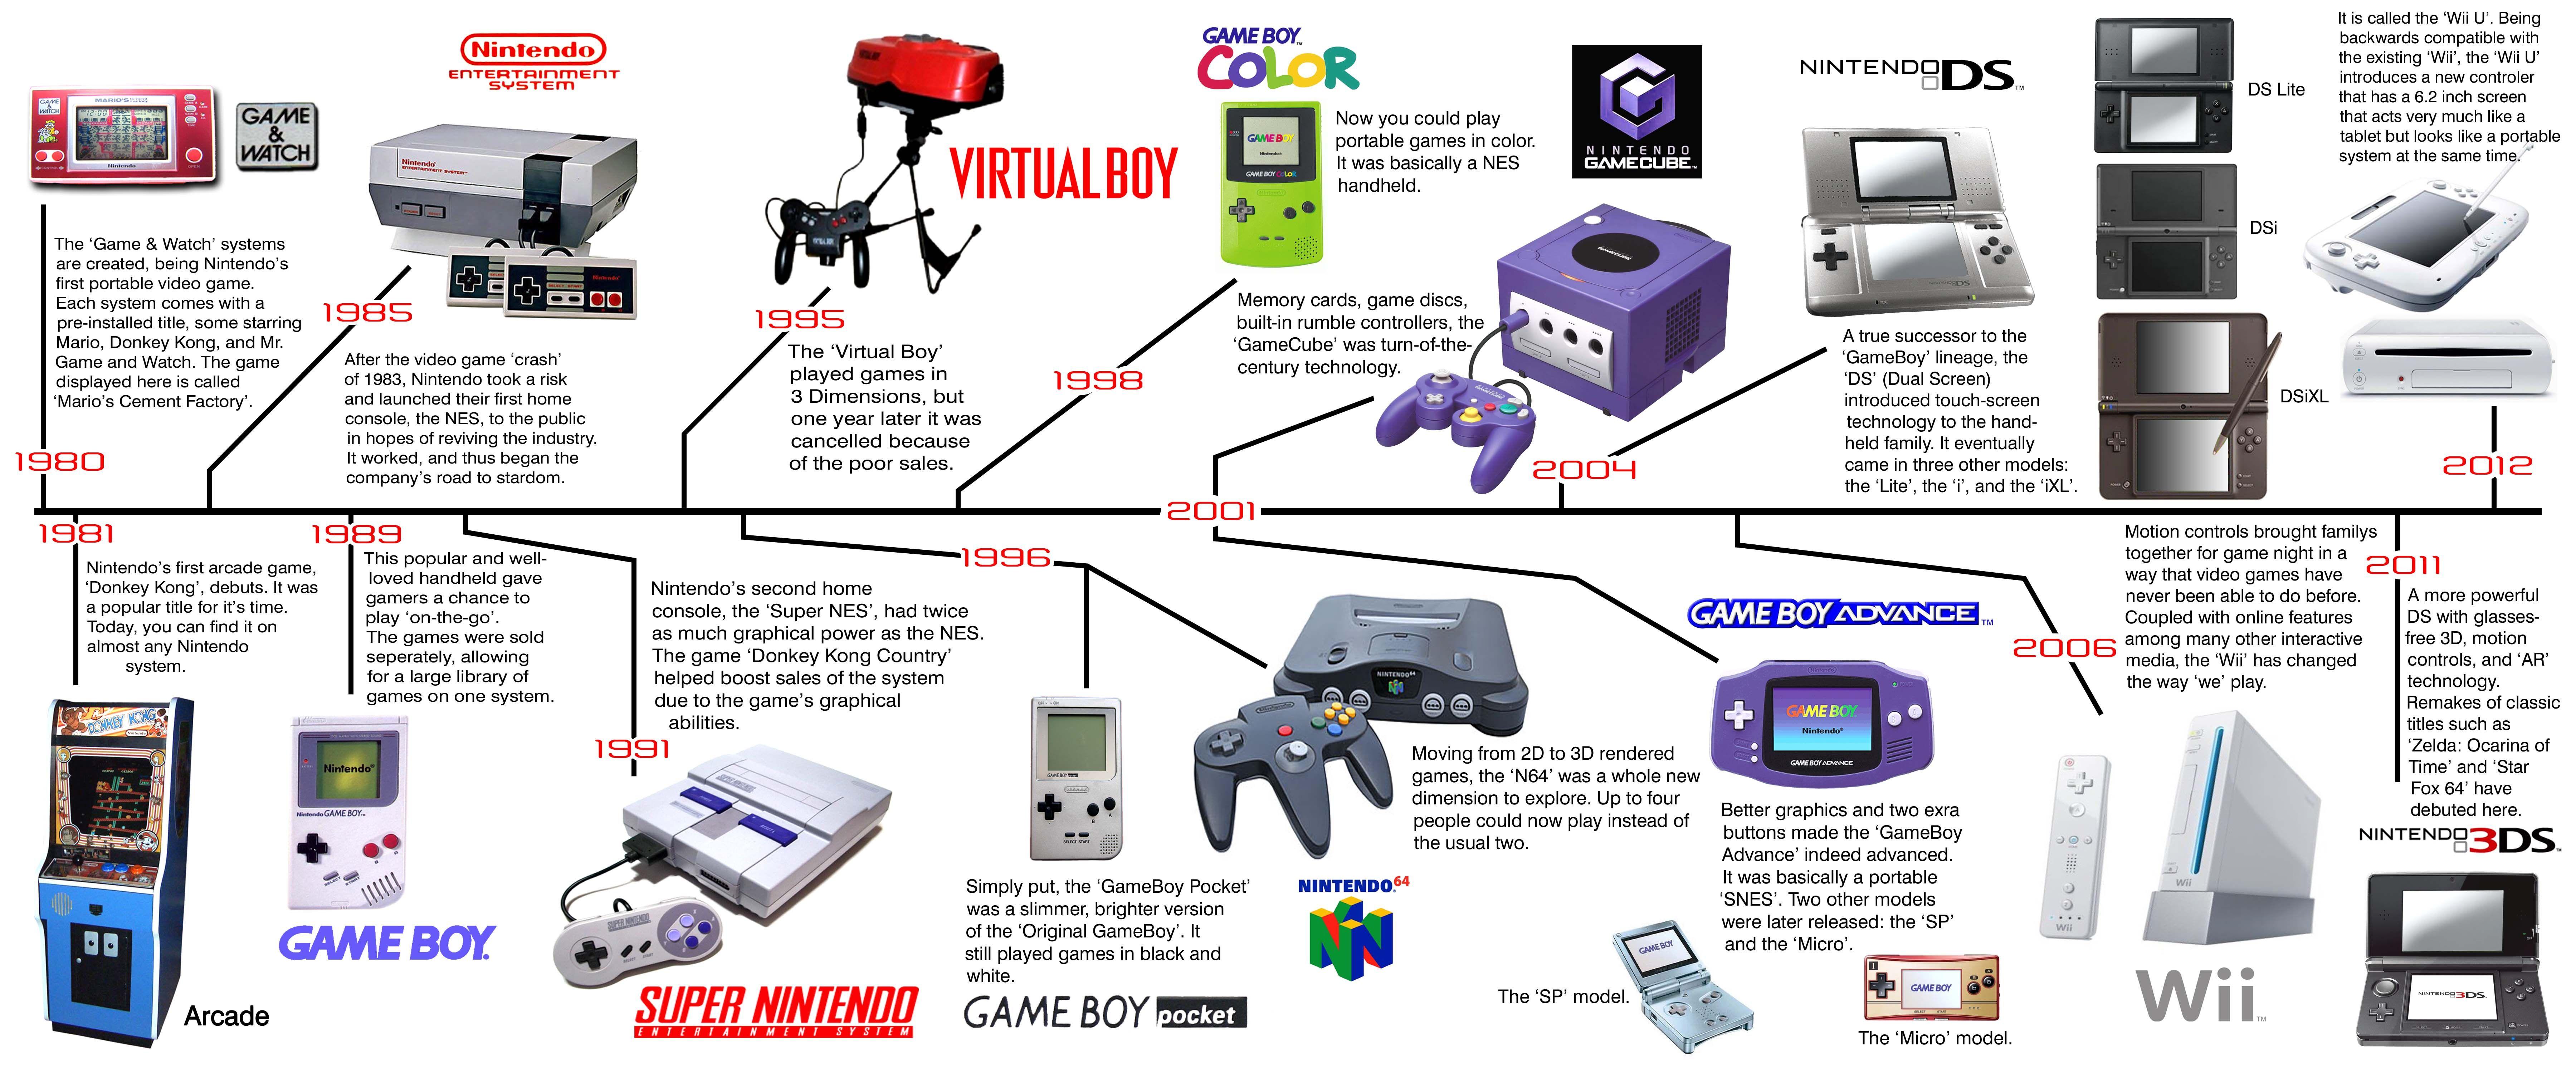 Nintendo Timeline | Game History | Pinterest | Nintendo and Timeline